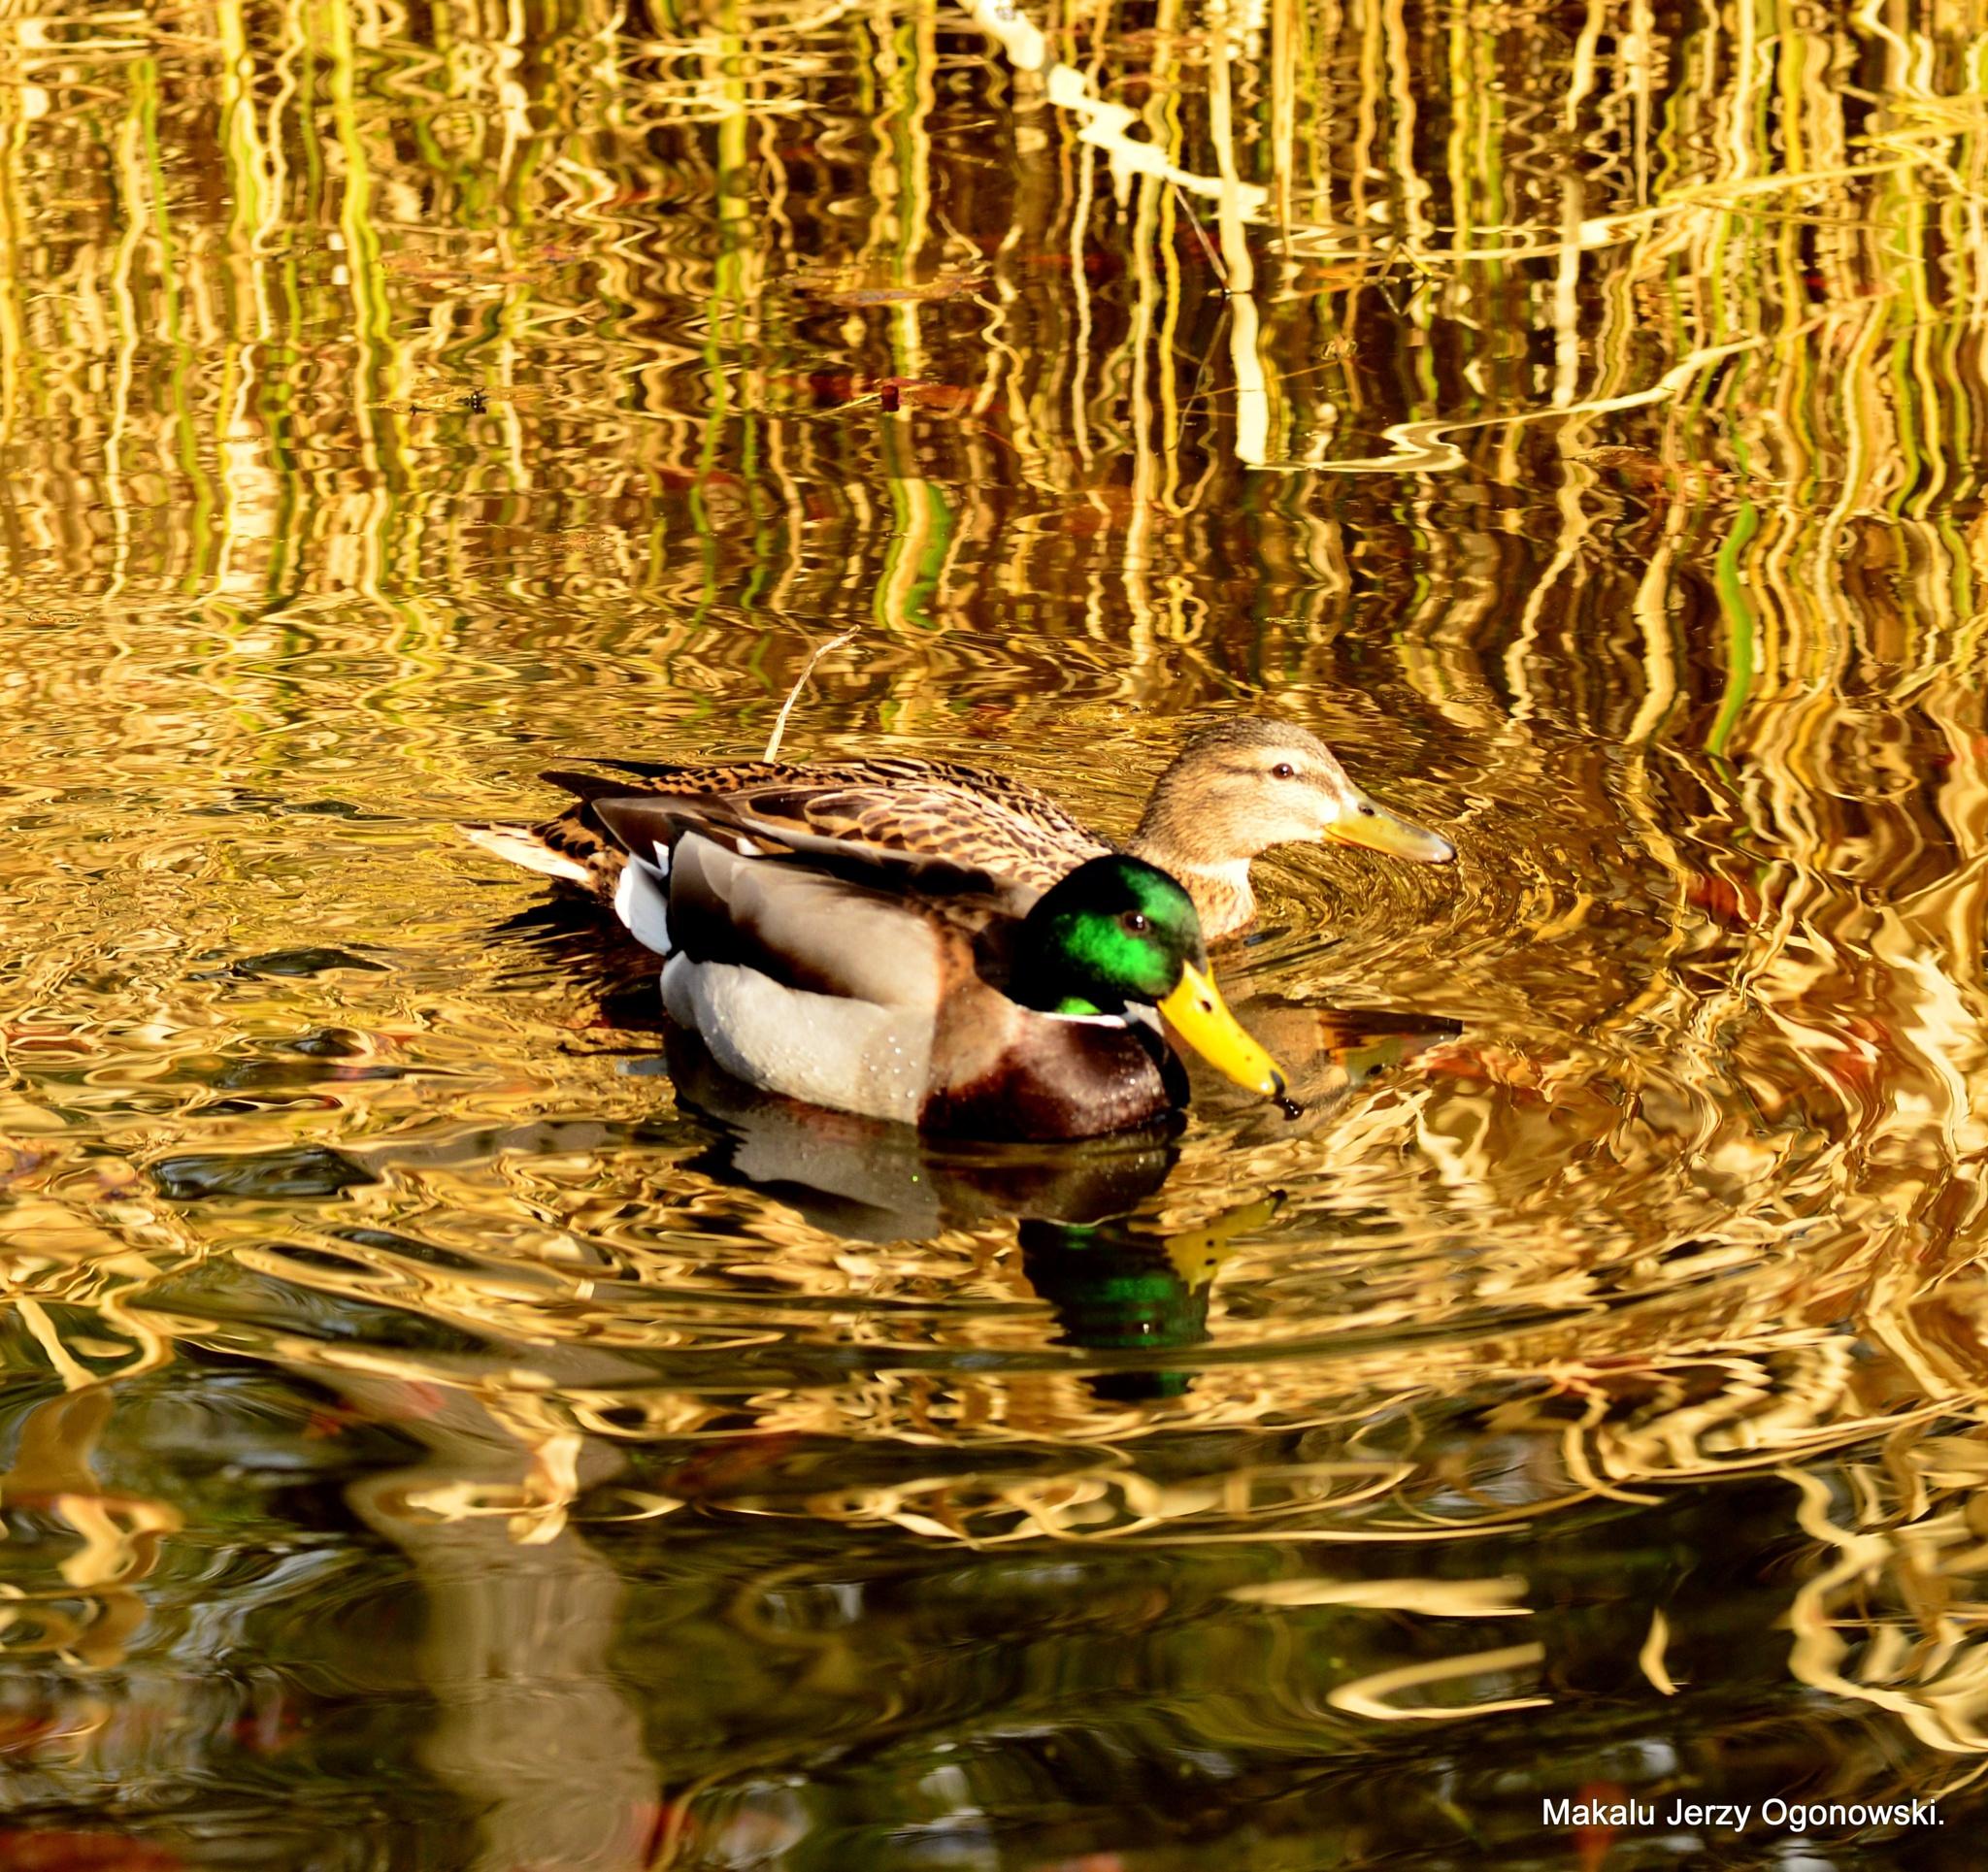 Mallard duck .(Male and female) by Makalu Jerzy Ogonowski